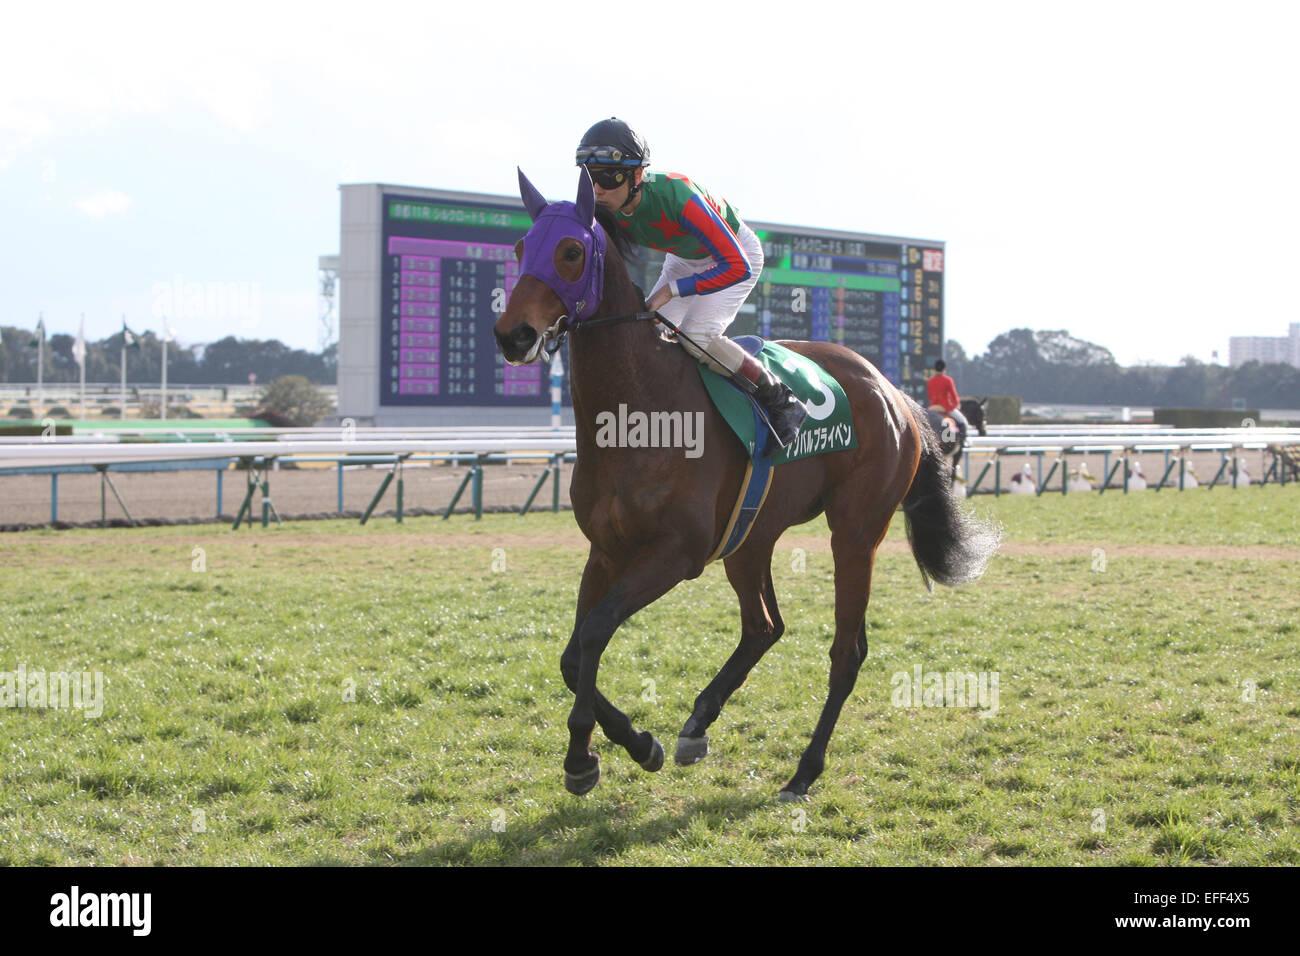 Kyoto, Japan. 1st Feb, 2015. Am Ball Bleiben (Ken Tanaka) Horse Racing : Am Ball Bleiben ridden by Ken Tanaka before - Stock Image